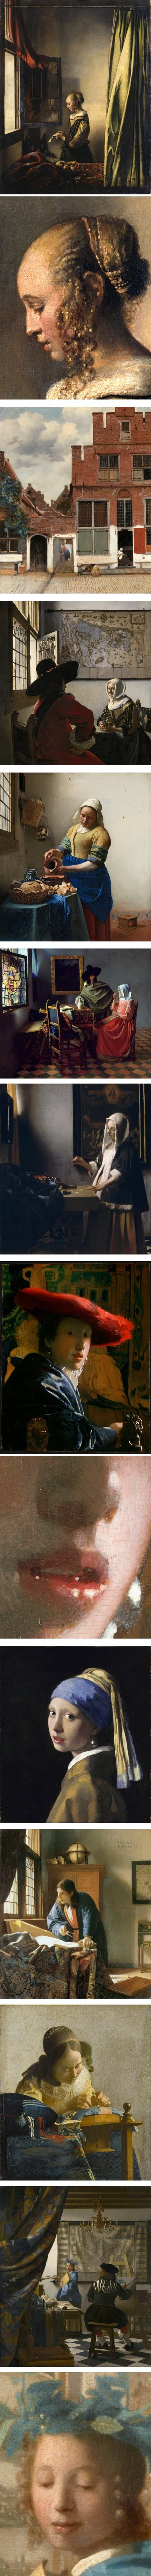 High resolution images of Vermeer's paintings